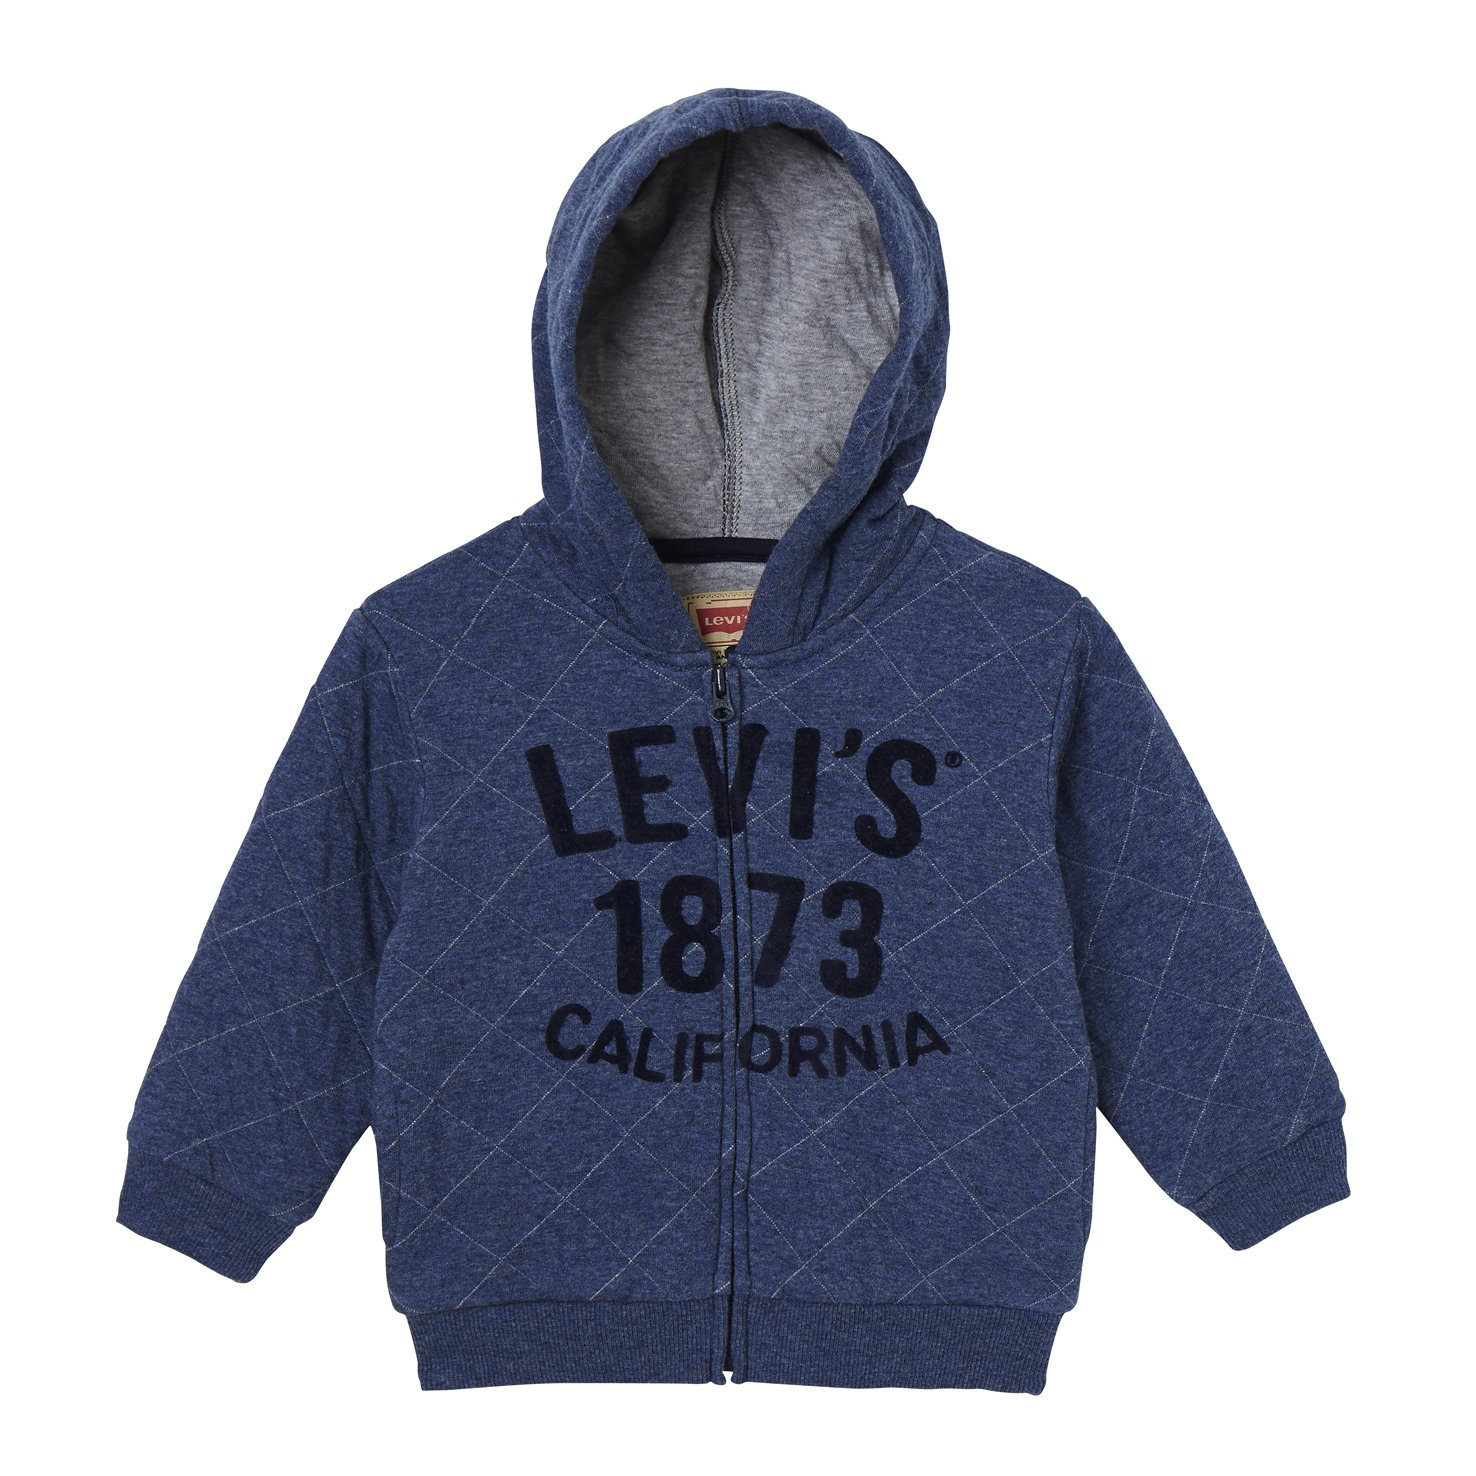 Levi's Kids Zipper Quilt, Felpa Bimbo Levi' s Kids Zipper Quilt NK17044